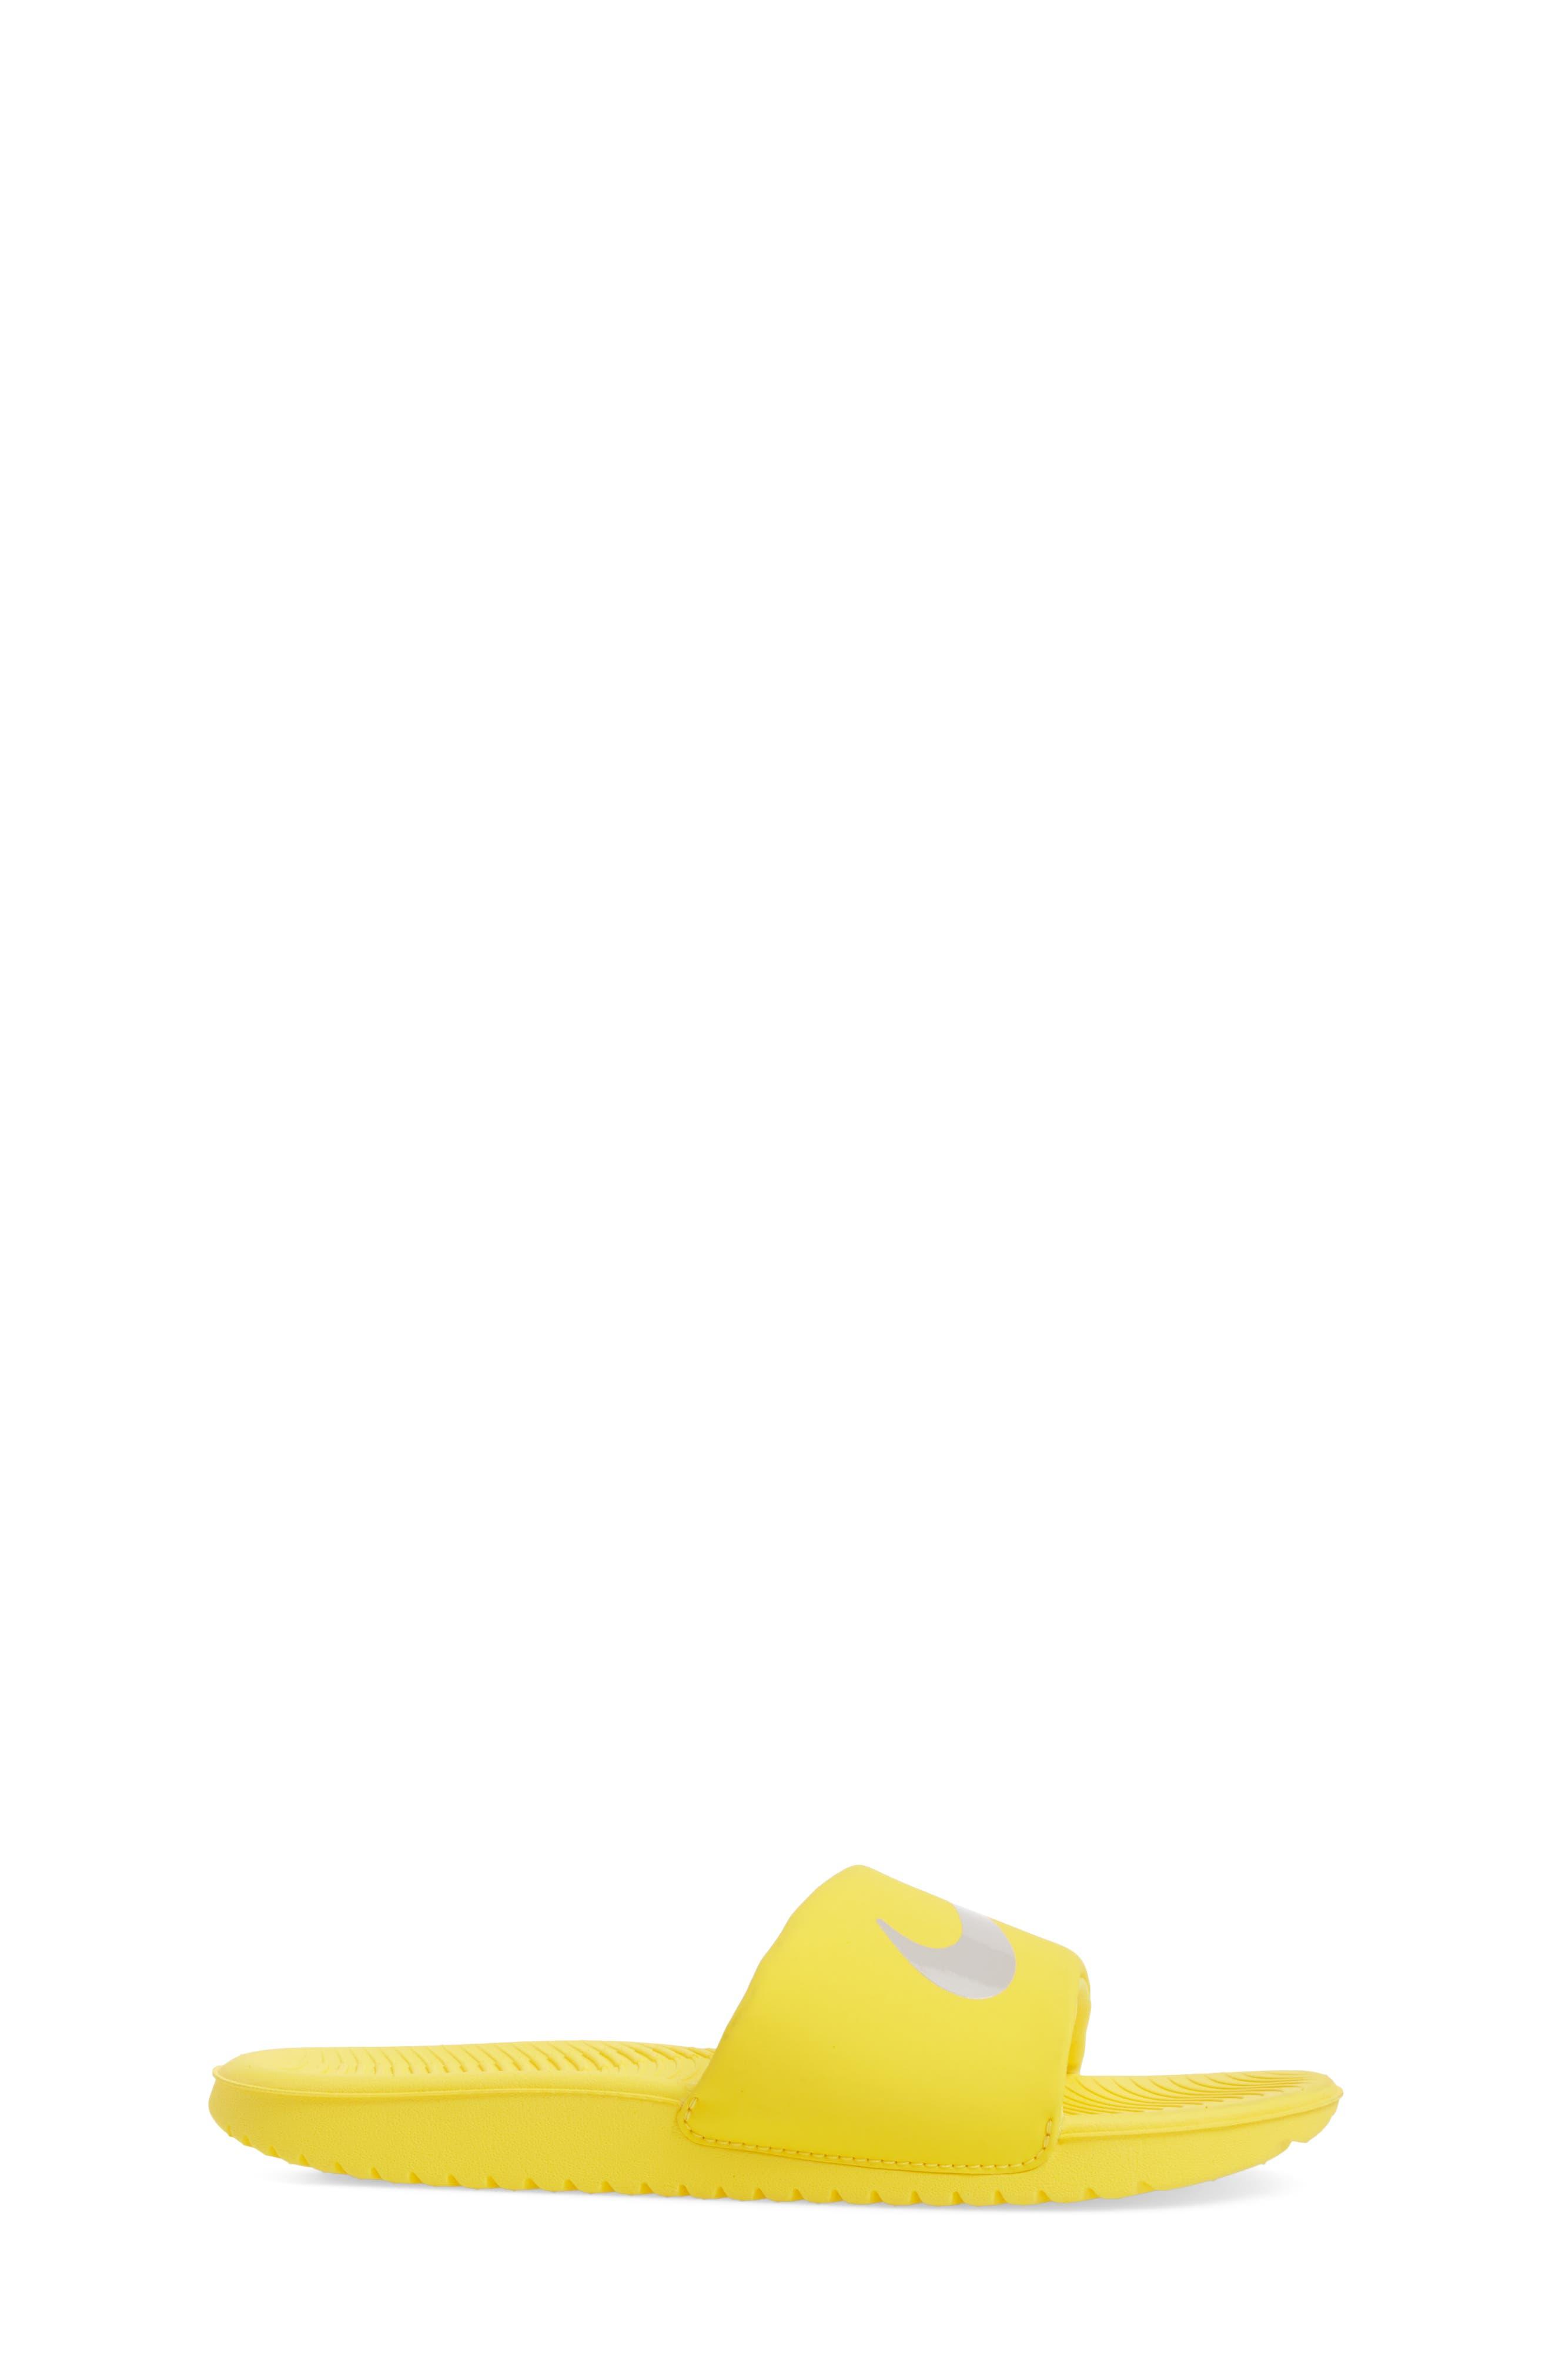 'Kawa' Slide Sandal,                             Alternate thumbnail 3, color,                             Yellow/ Atmosphere Grey